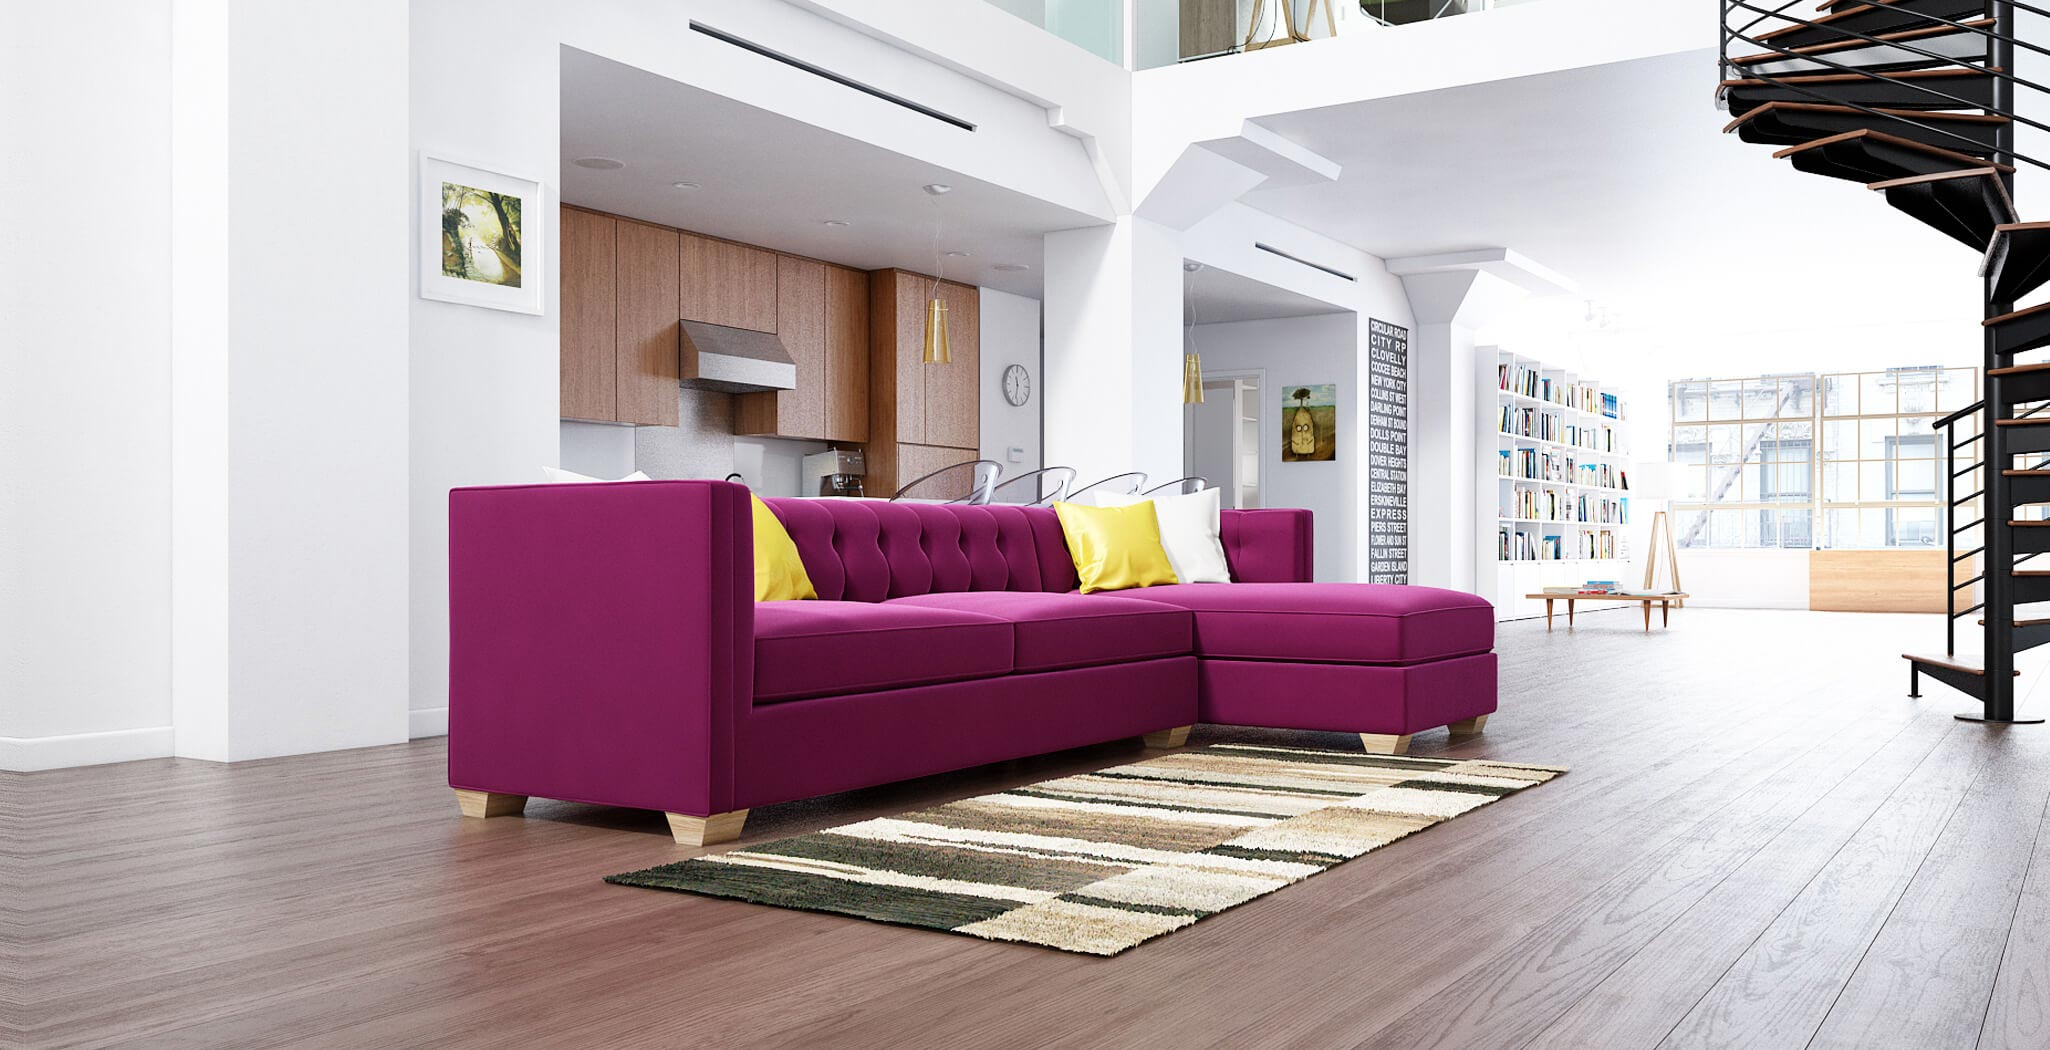 grant panel furniture gallery 3